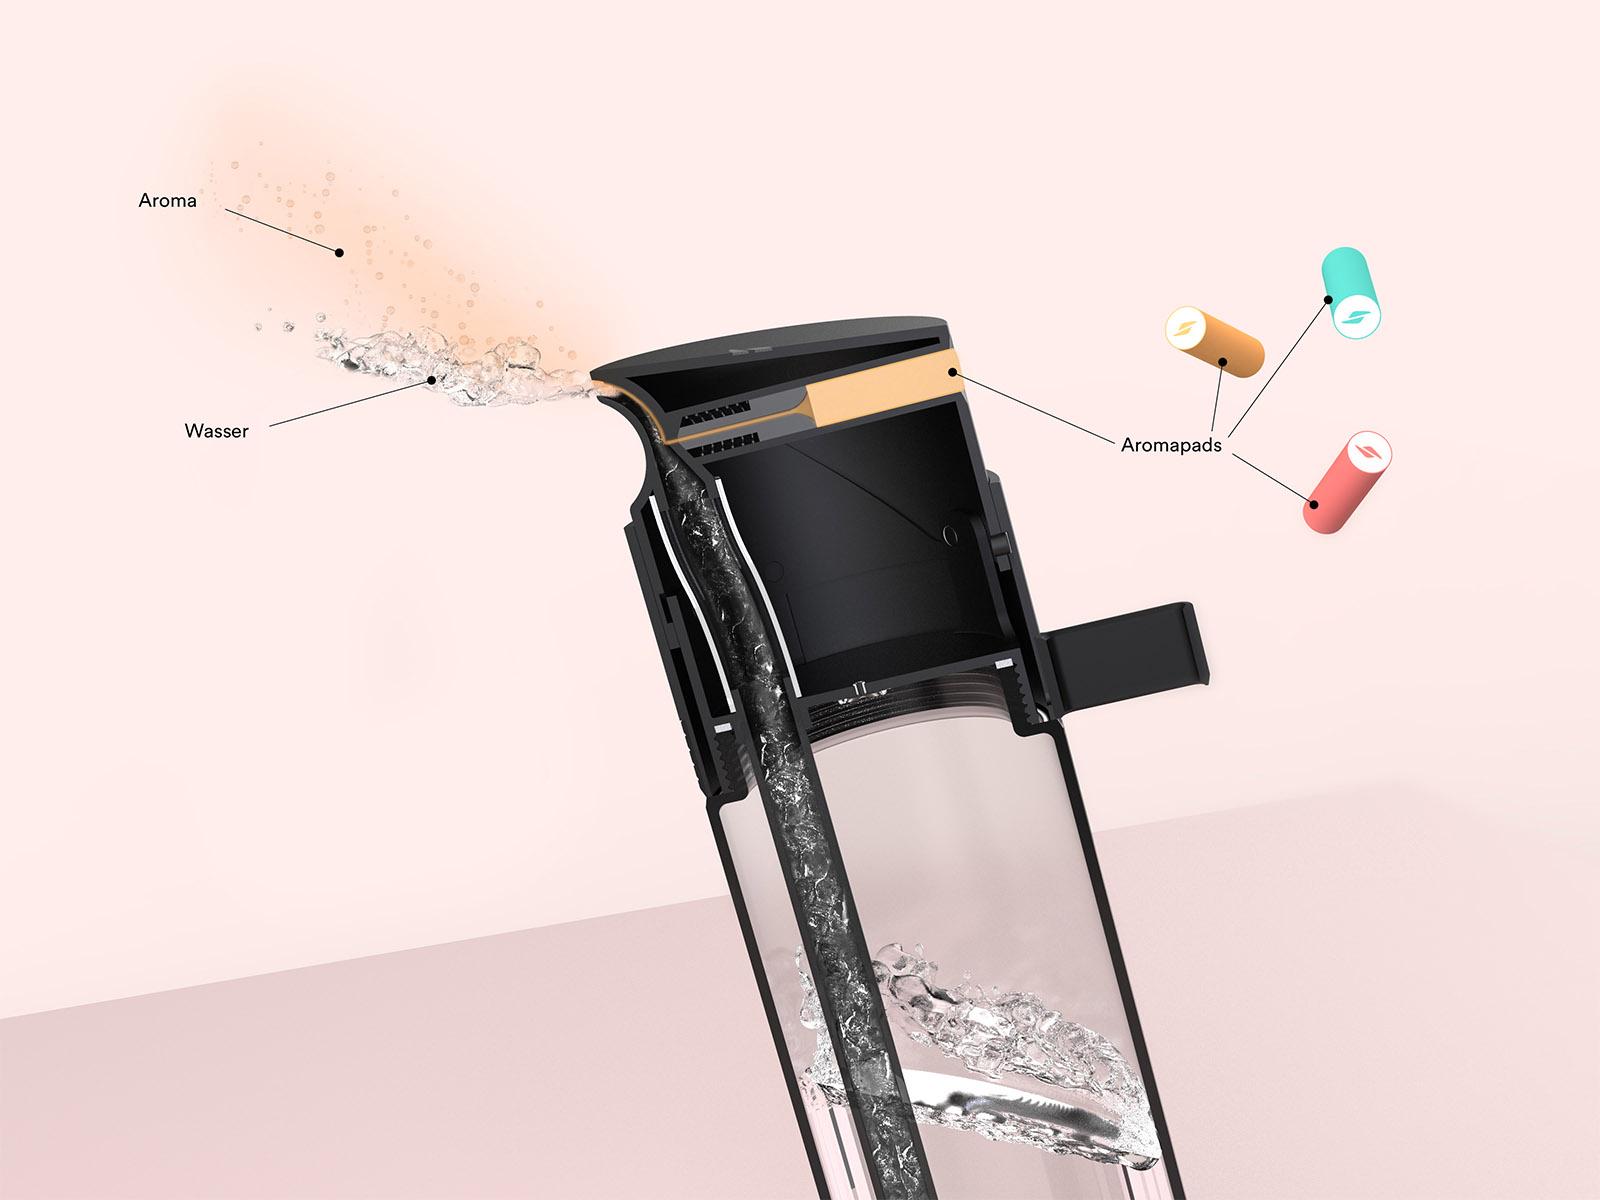 stryve-bottle-design-produkt-designagentur-agentur-kreativ